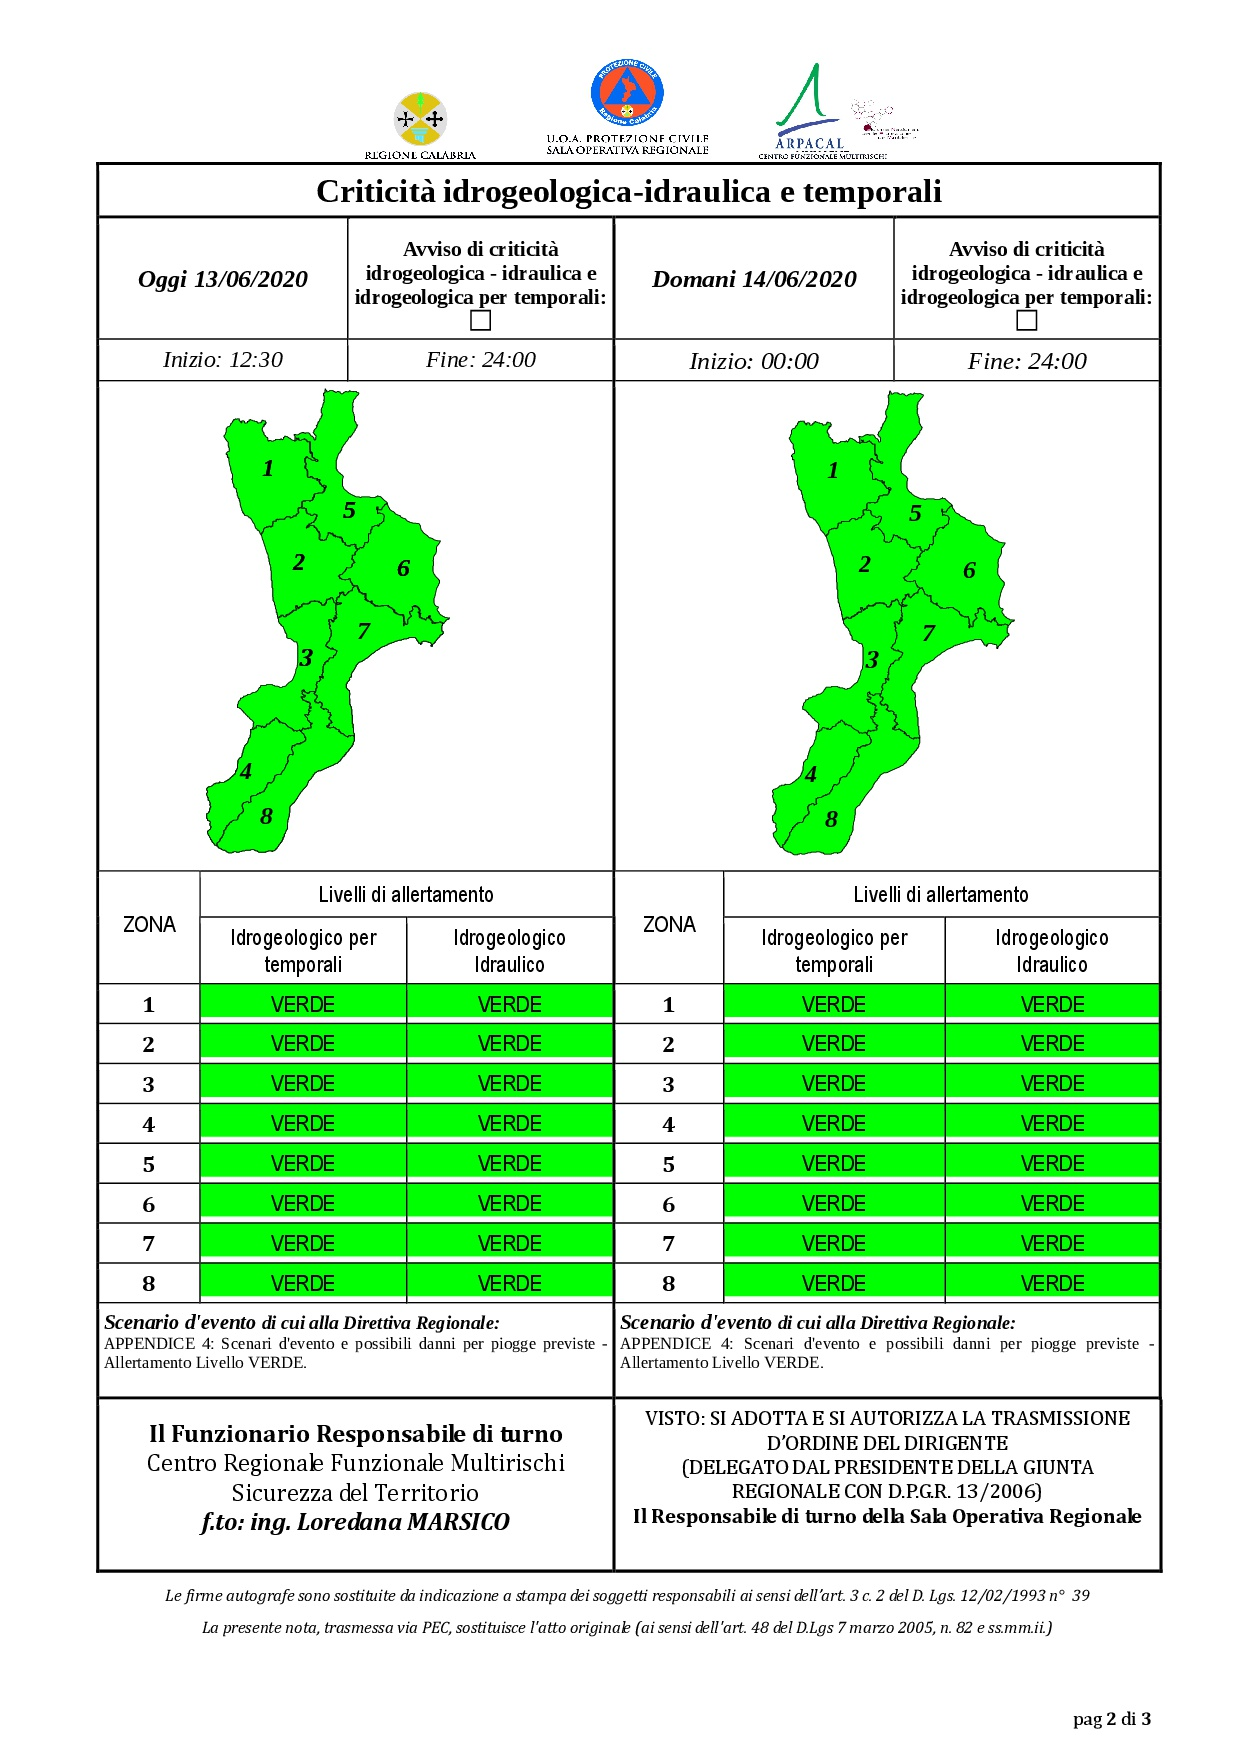 Criticità idrogeologica-idraulica e temporali in Calabria 13-06-2020